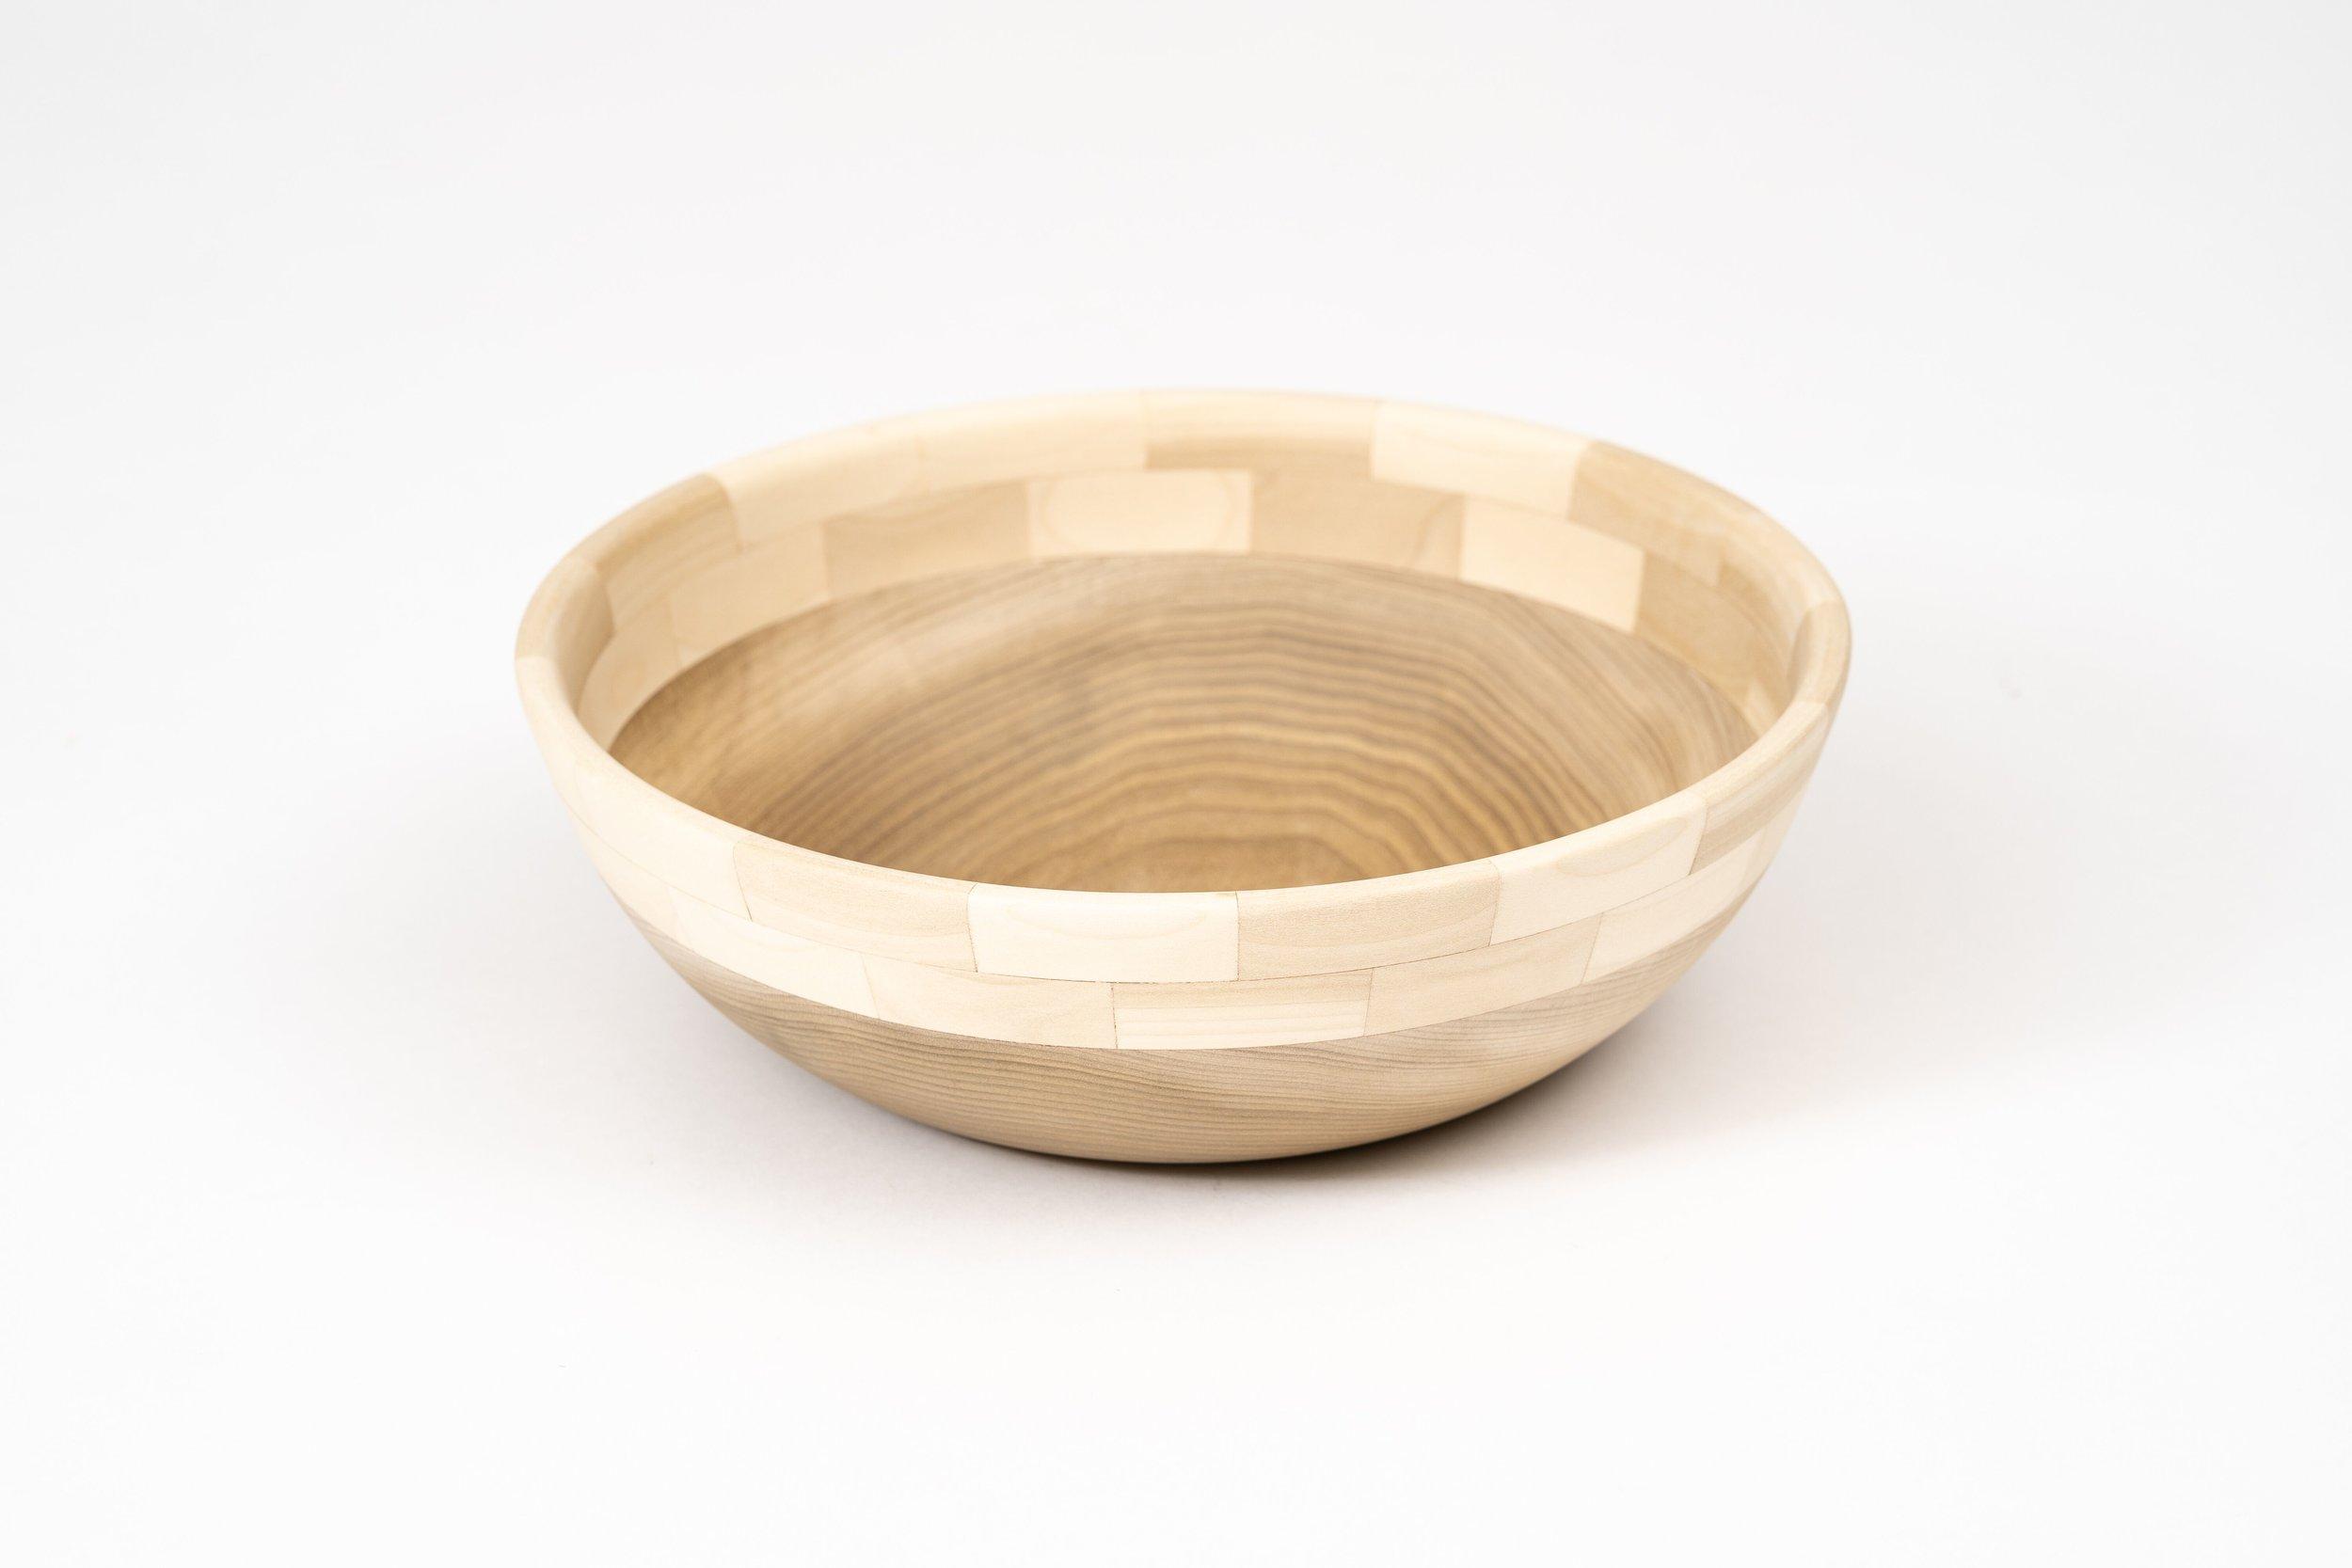 segmented-poplar-wooden-bowl-dean-babin